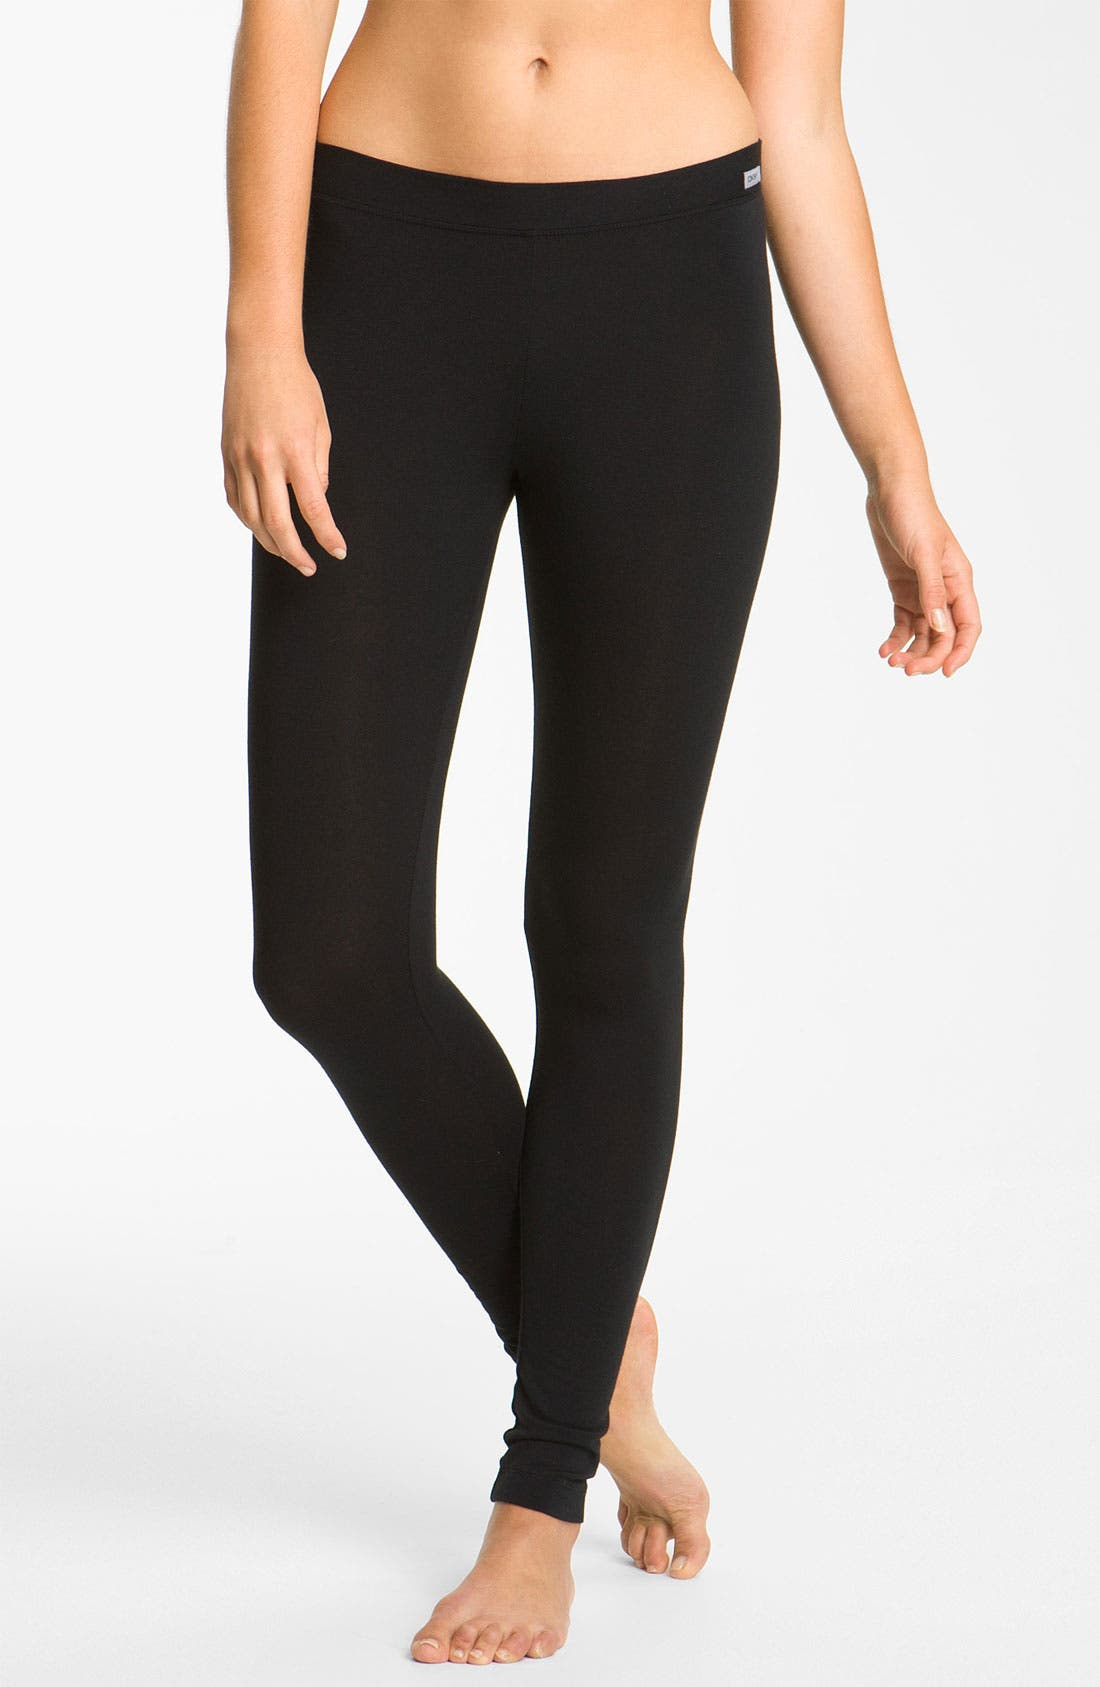 Alternate Image 1 Selected - DKNY 'Effortlessly' Long Leggings